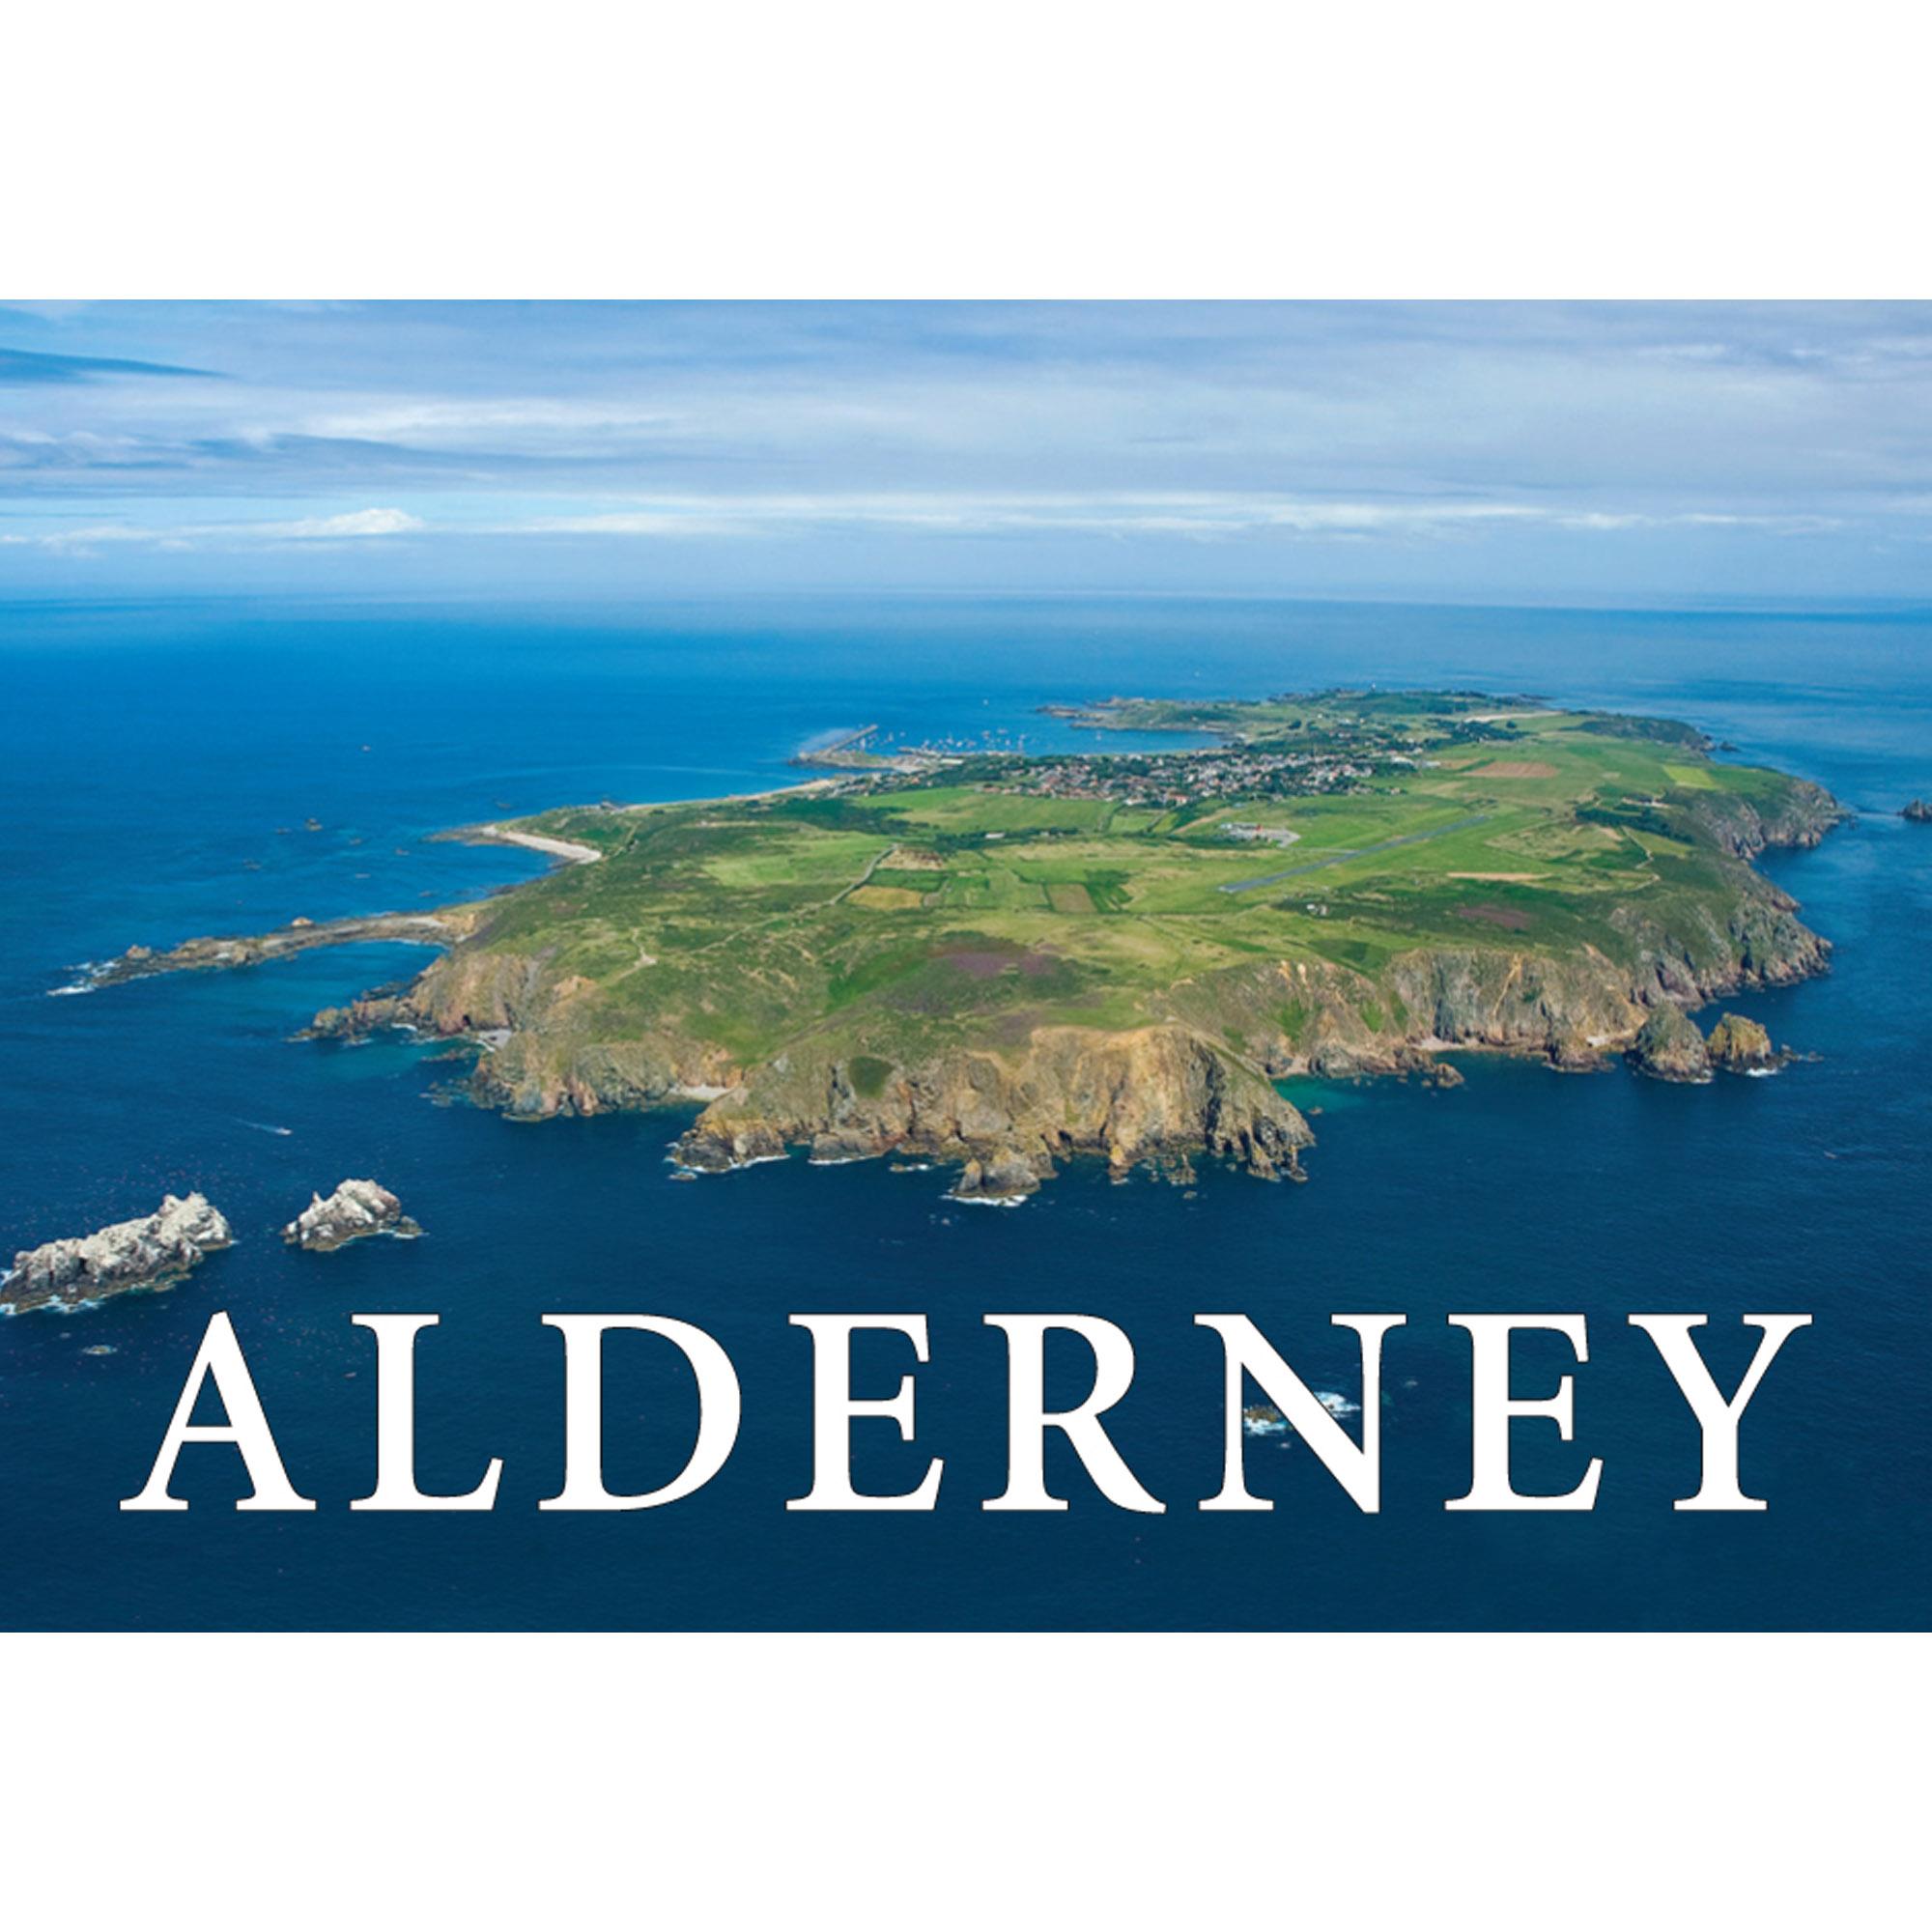 Alderney fridge magnet